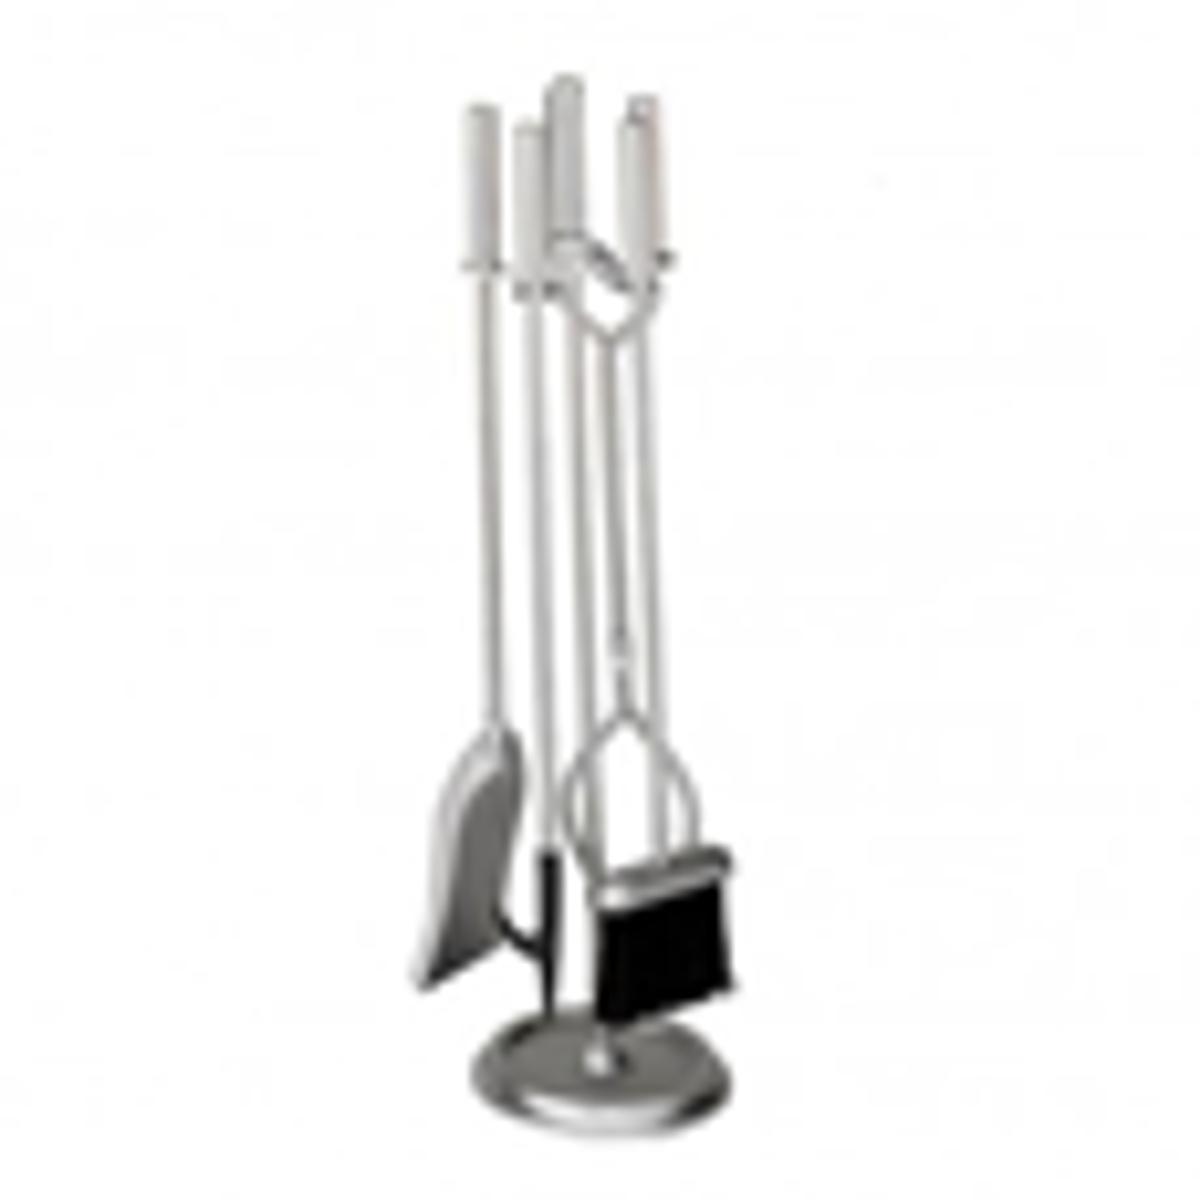 Brushed Steel Tool Sets